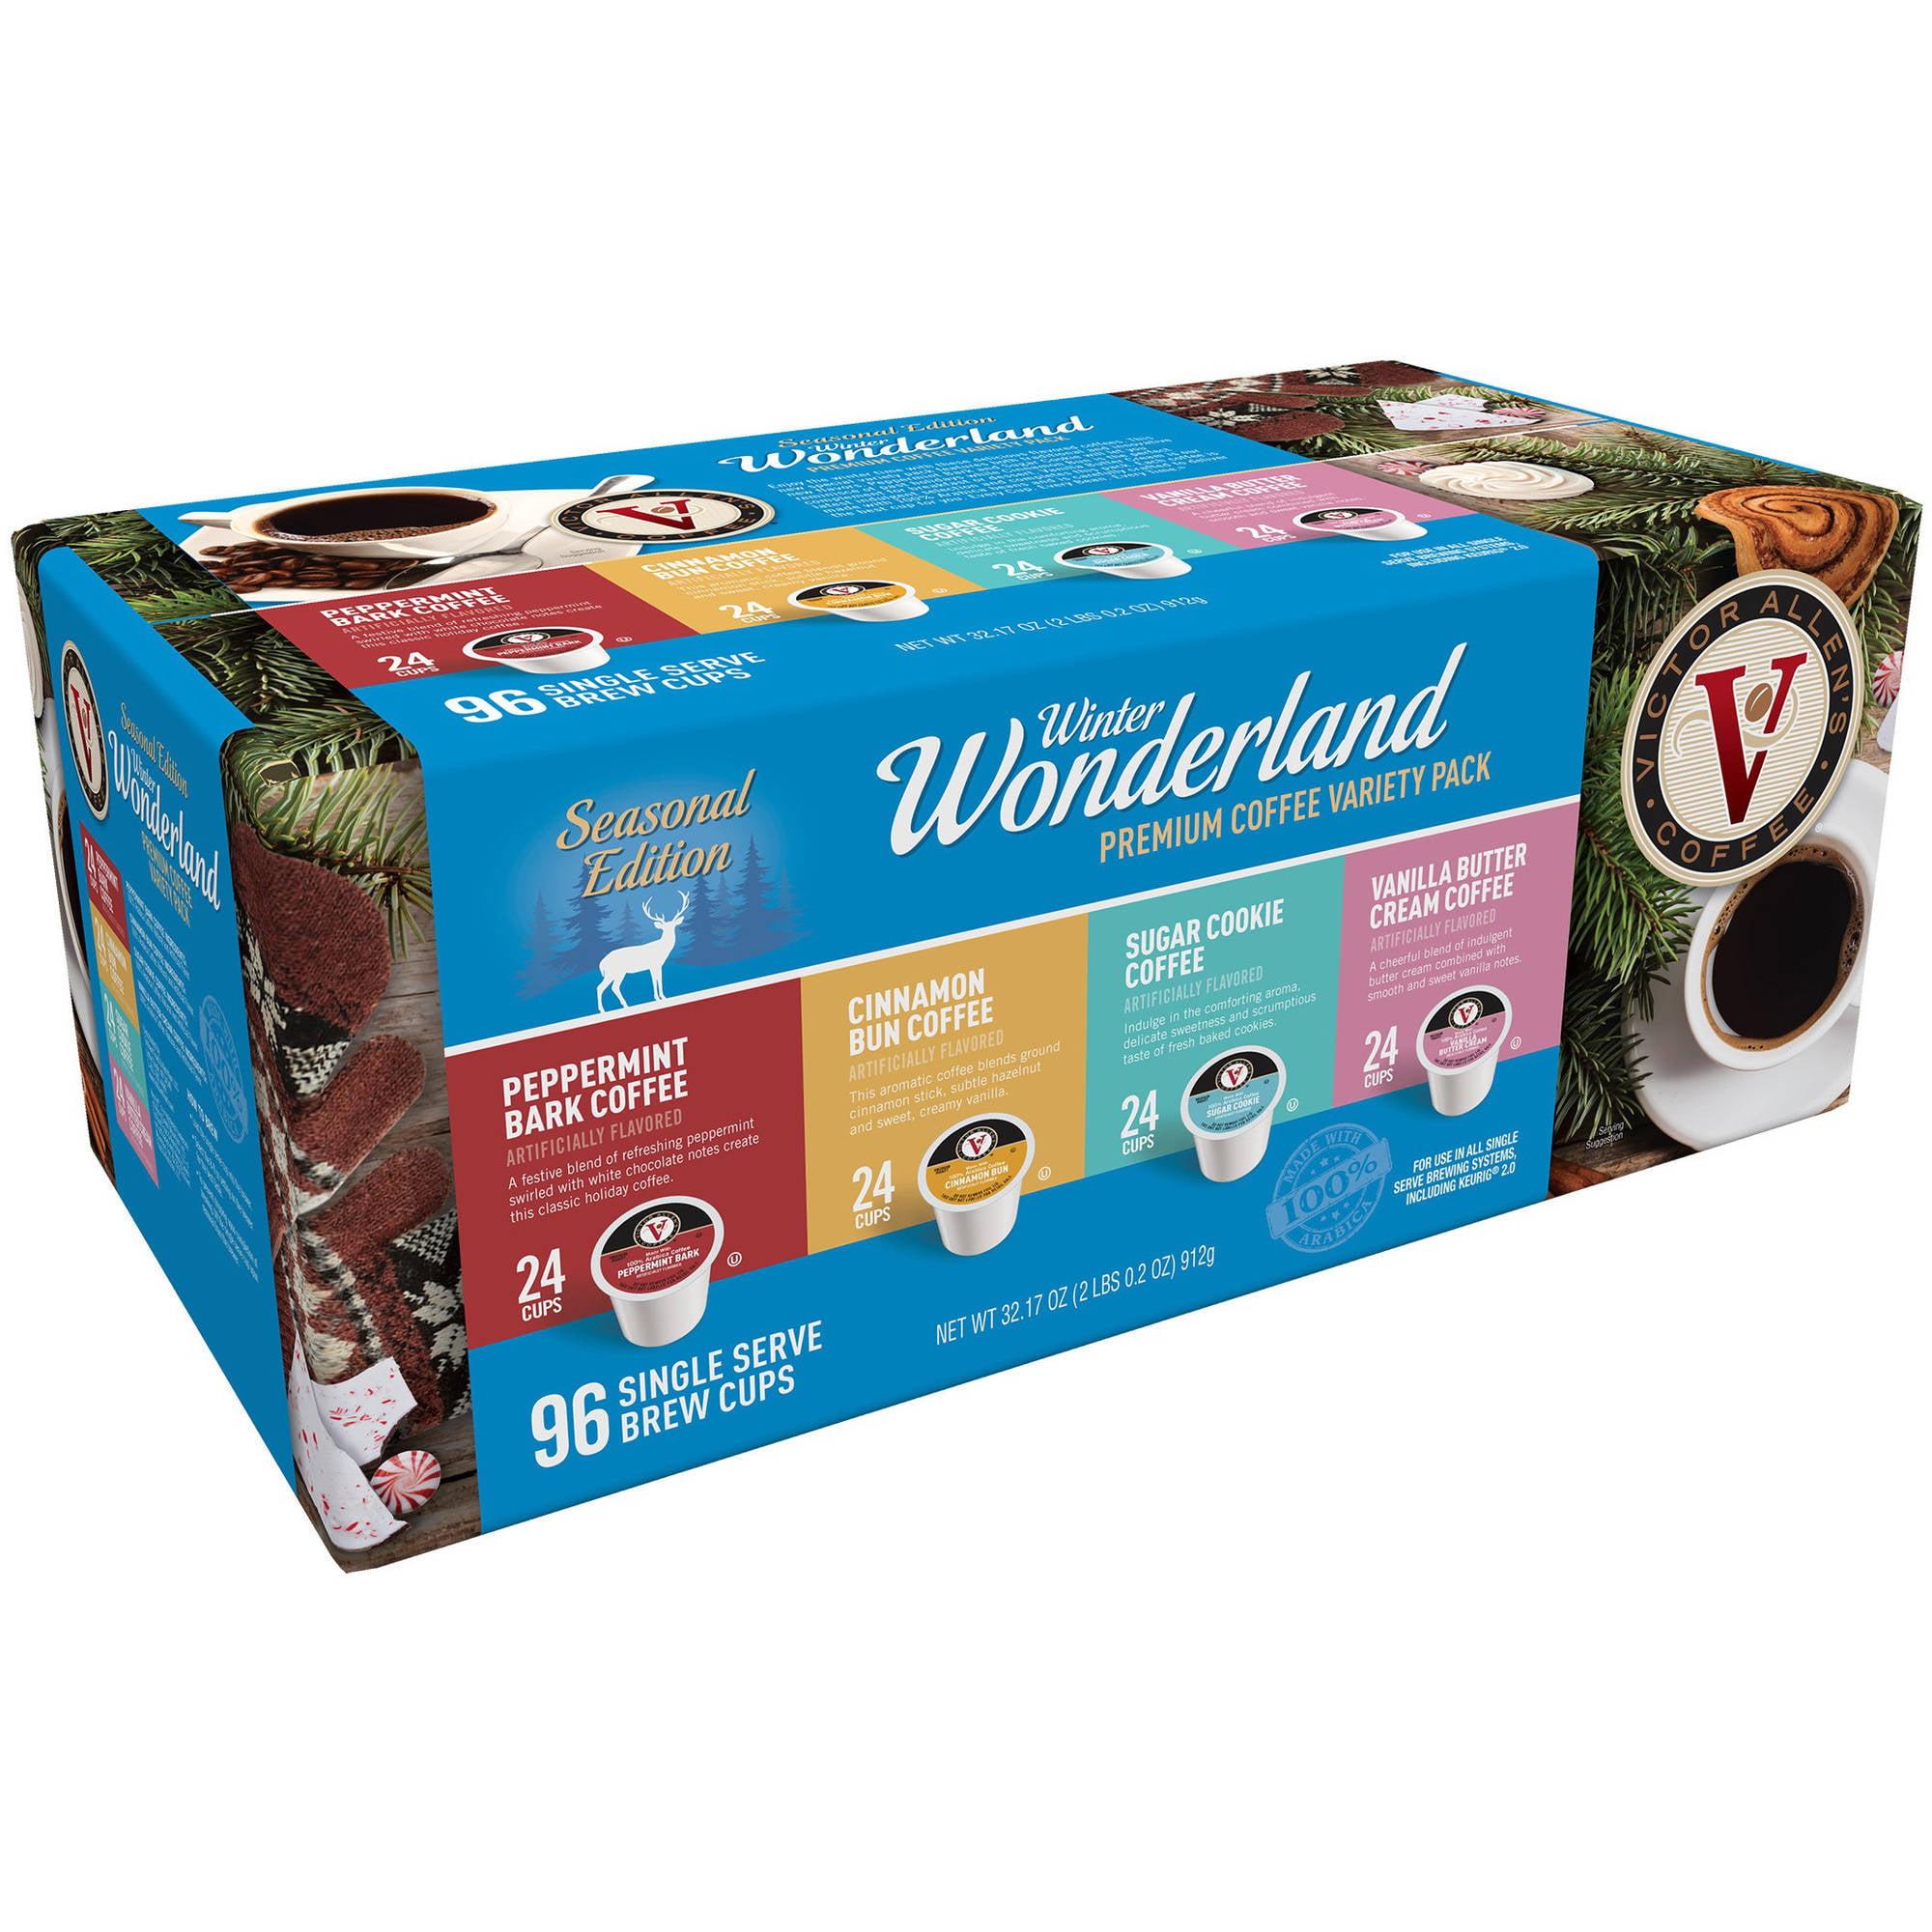 Victor Allen's Seasonal Edition Winter Wonderland Premium Coffee Variety Pack Single Serve Brew Cups, 96 count